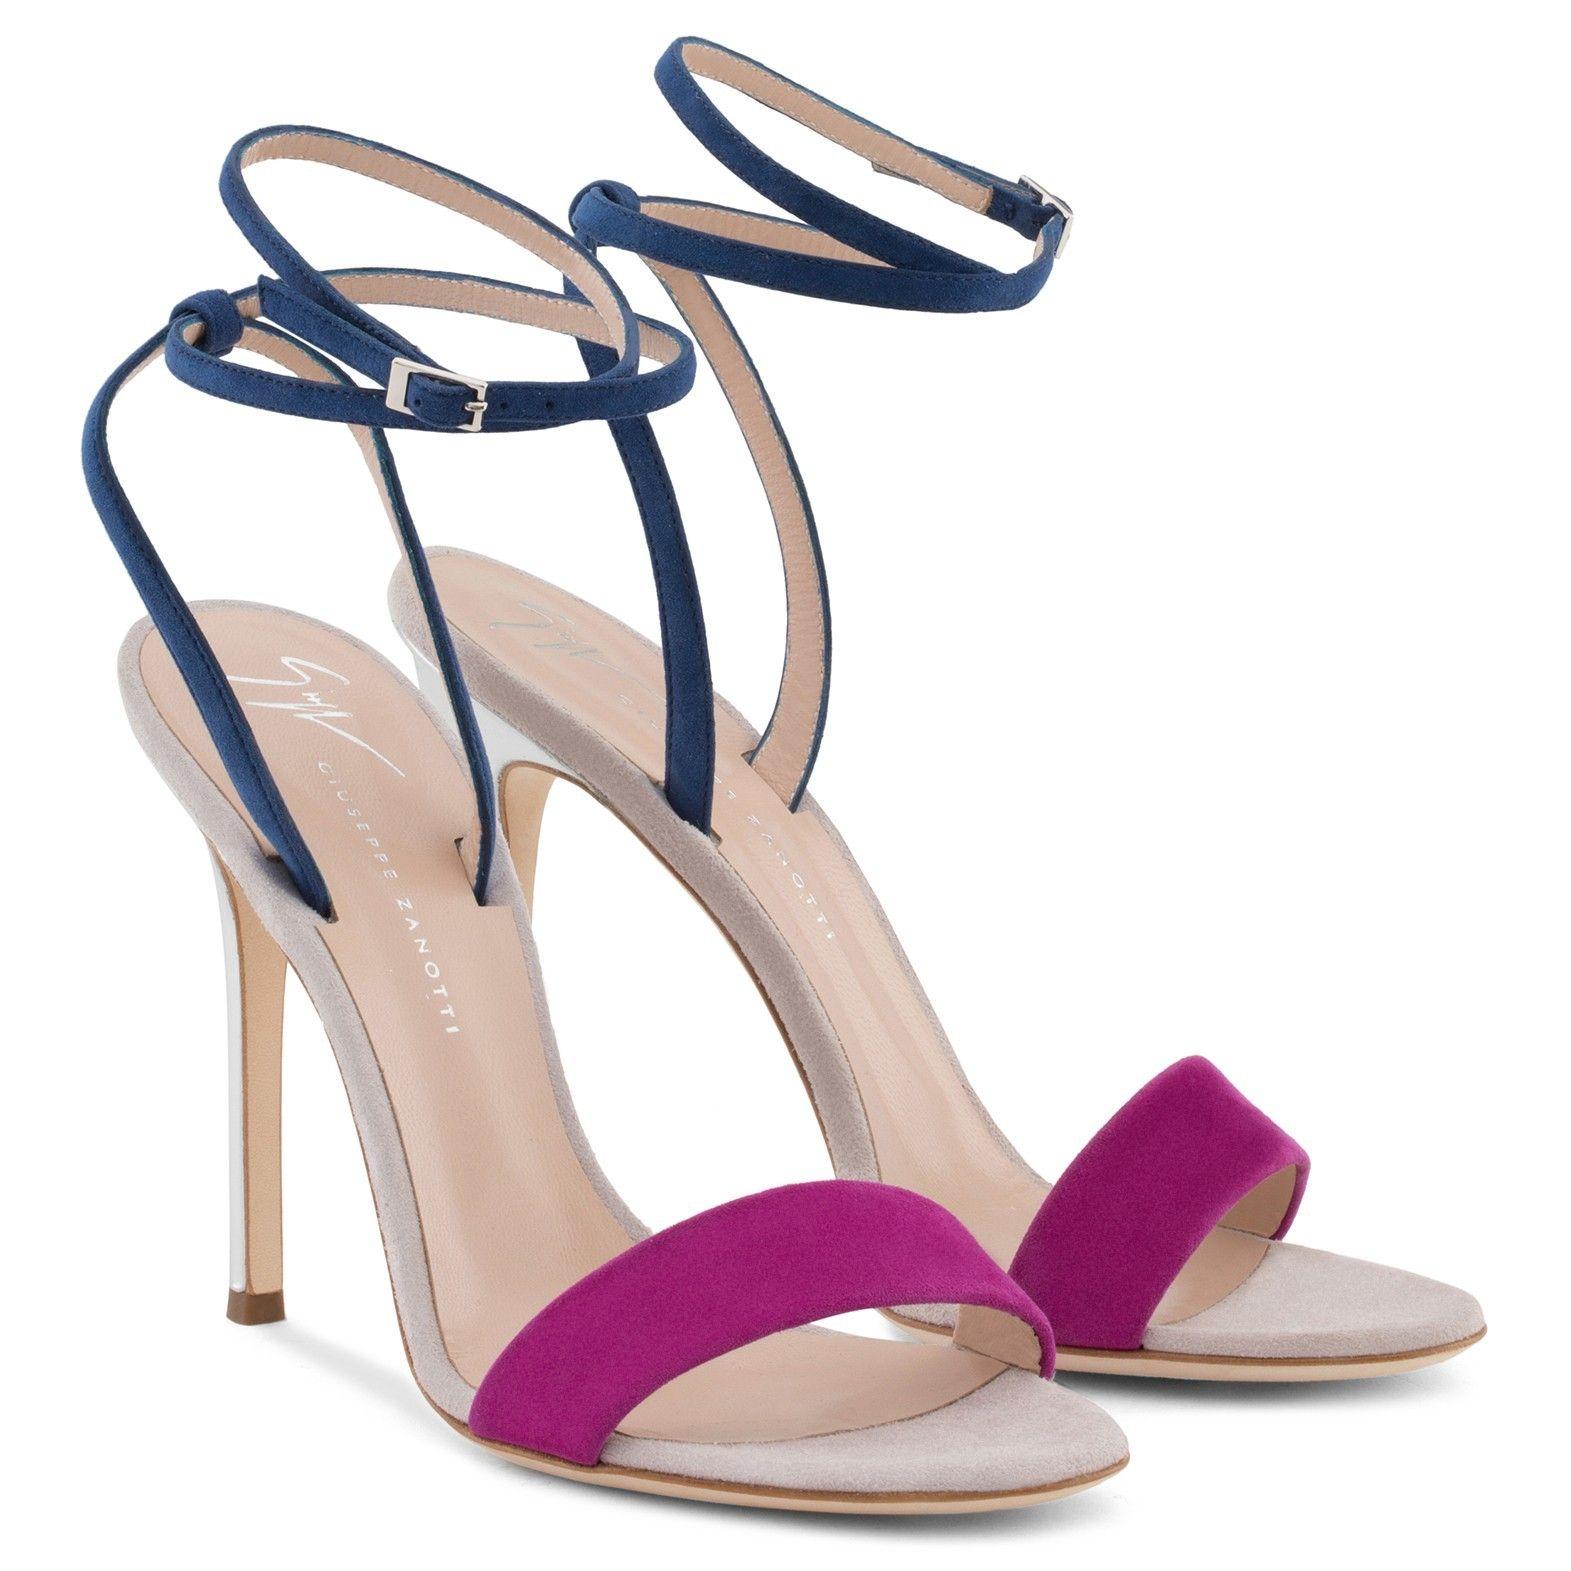 Giuseppe Zanotti Blue and purple suede sandal GEORGINA hQW4KuJW